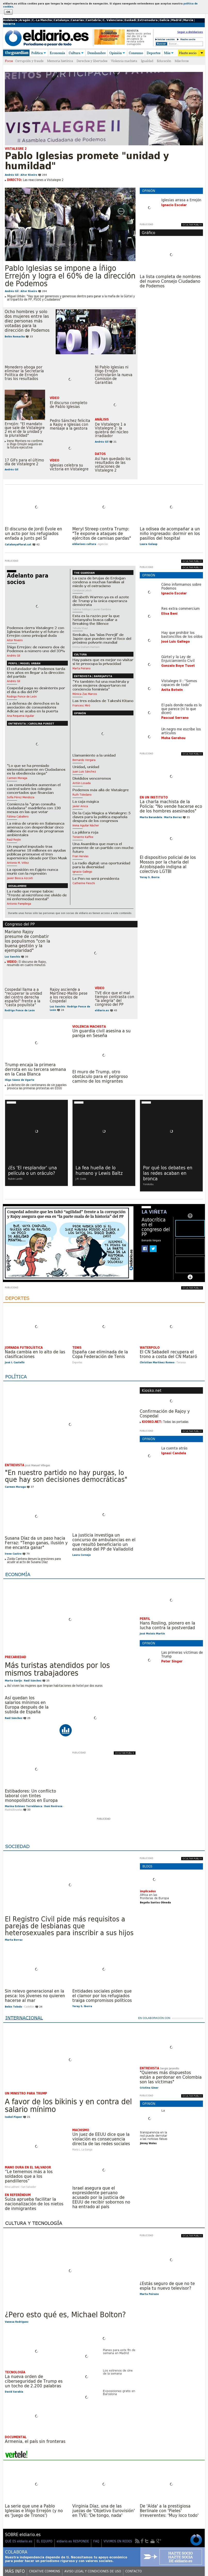 El Diario at Monday Feb. 13, 2017, 3:03 a.m. UTC